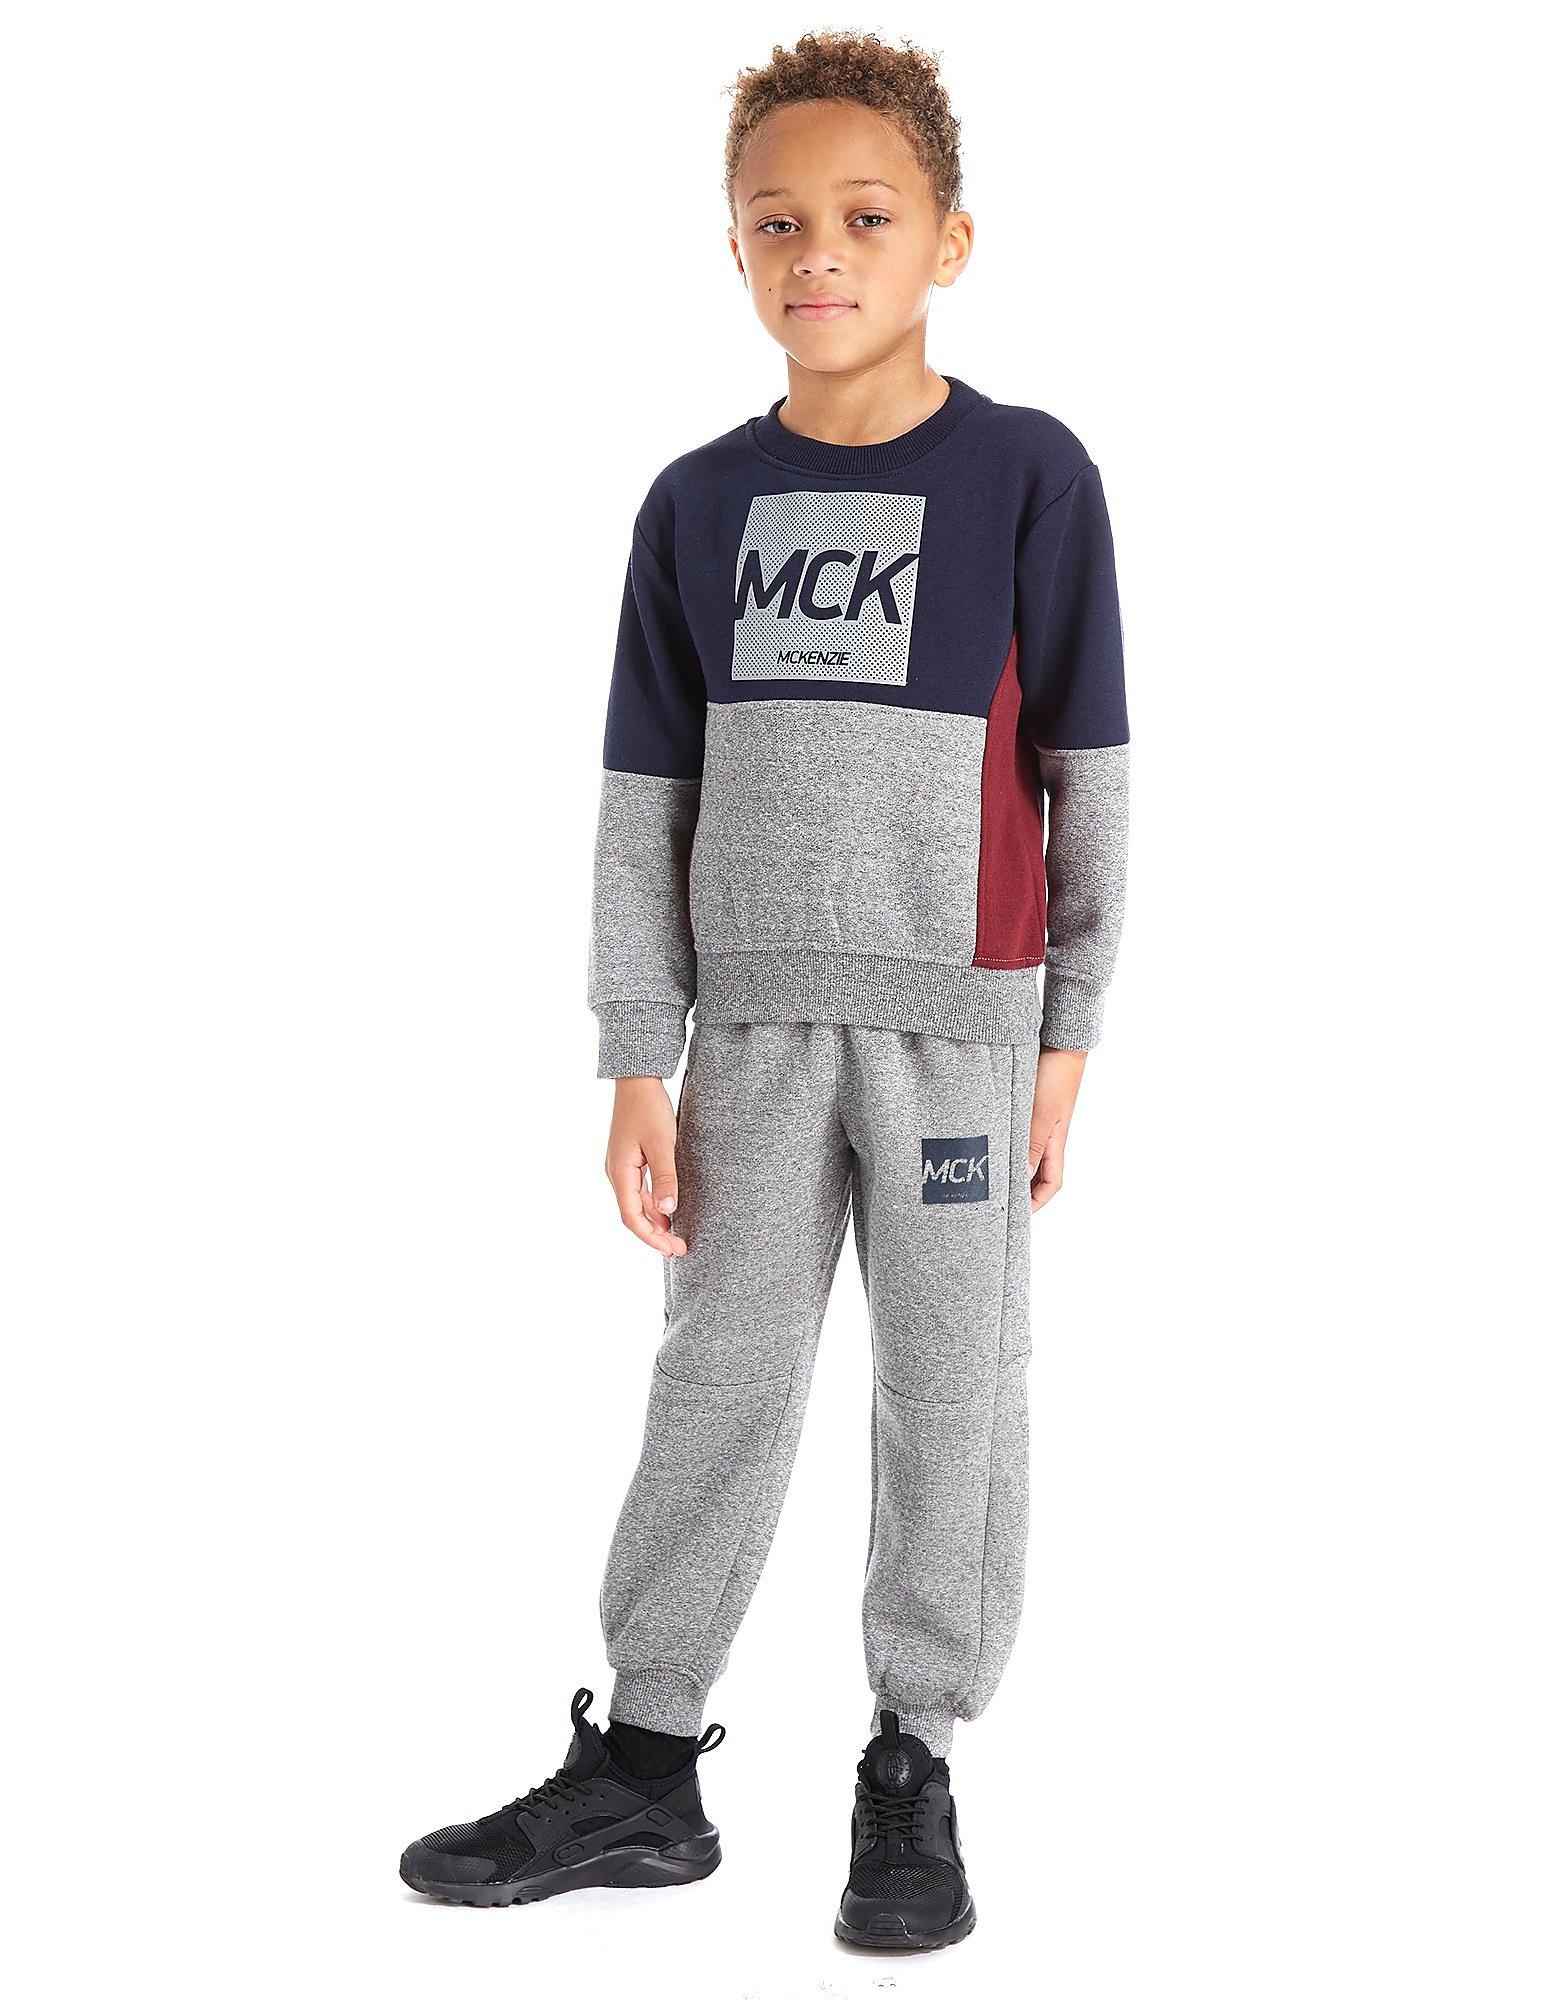 McKenzie Orson Colour Block Suit Children